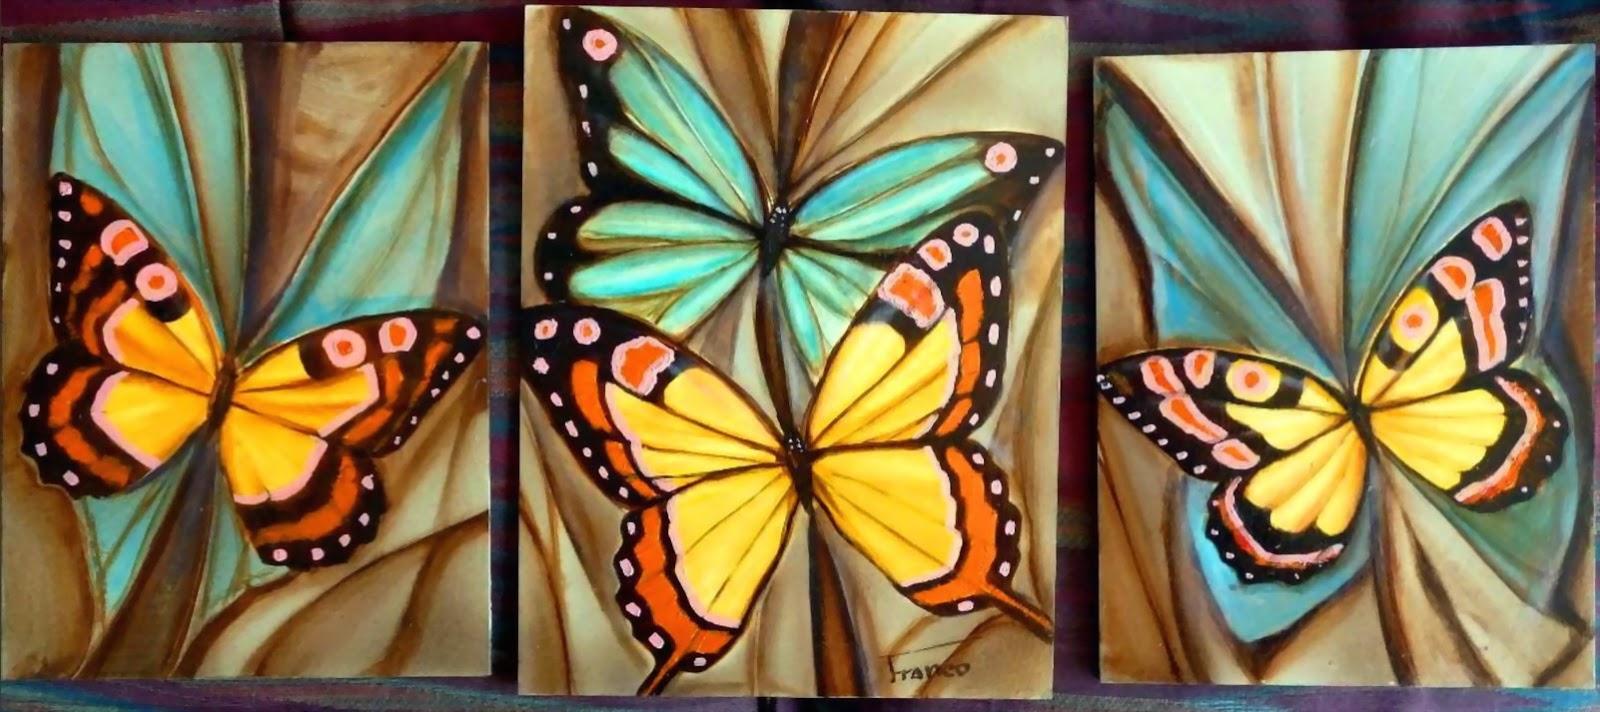 Cuadros Modernos Pinturas Y Dibujos Dise Os Para Pintar Dibujos Abstractos Para  Pintar Cuadros